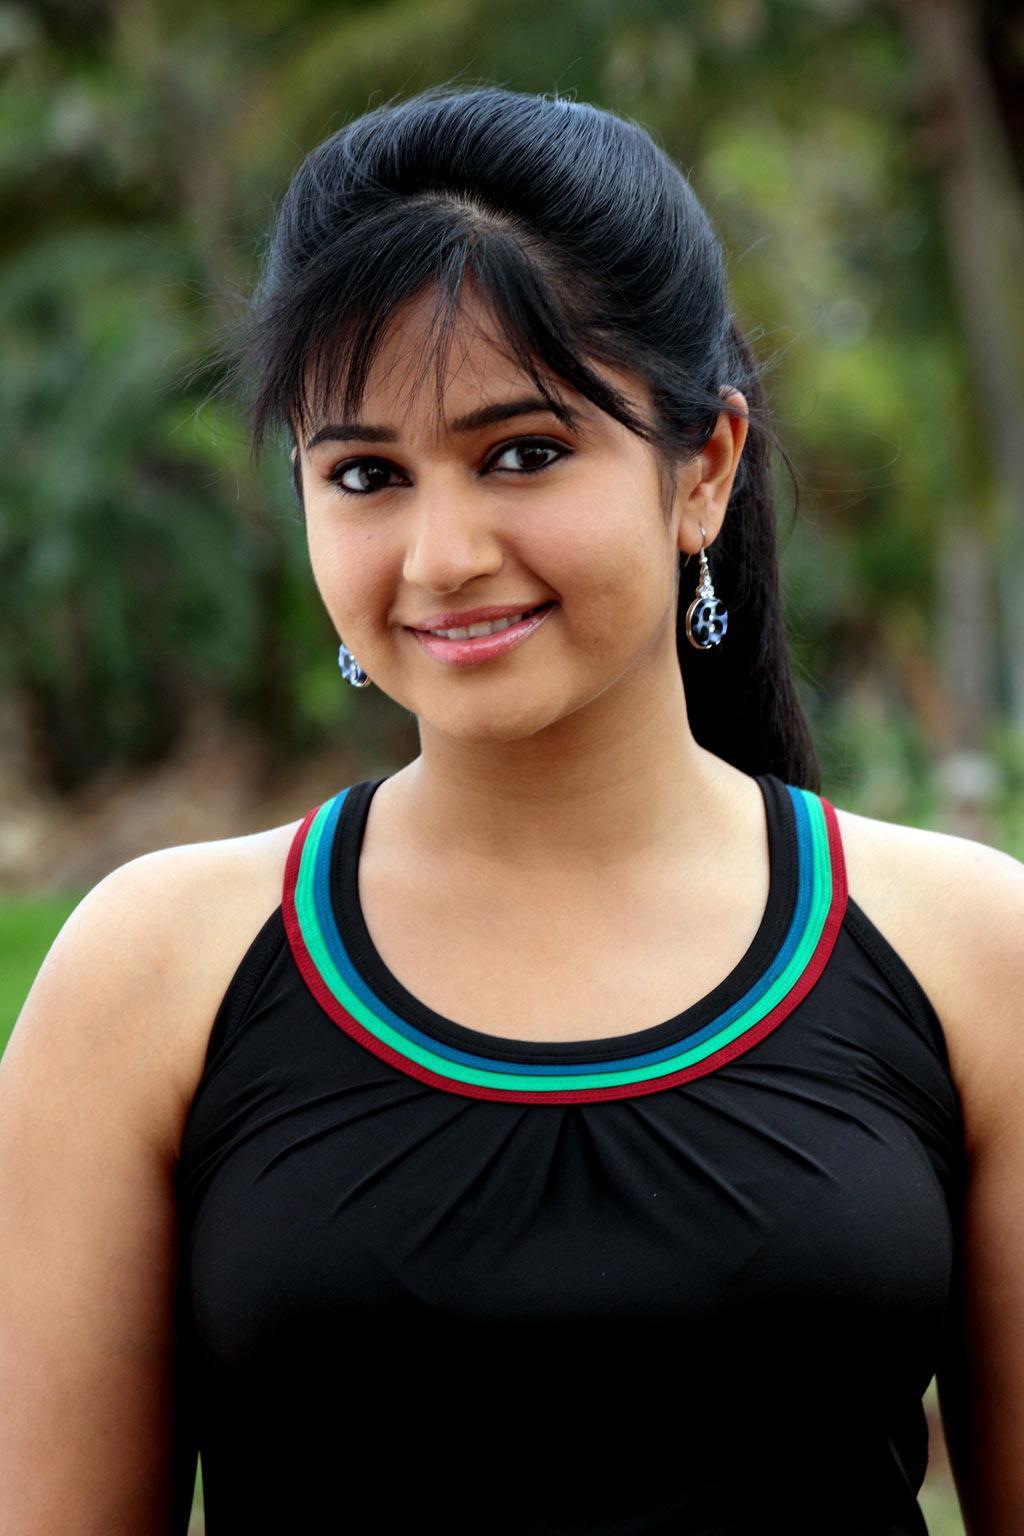 Celebrities Images Online: Poonam bajwa Most Beautiful Pics Shefali Sharma Hot